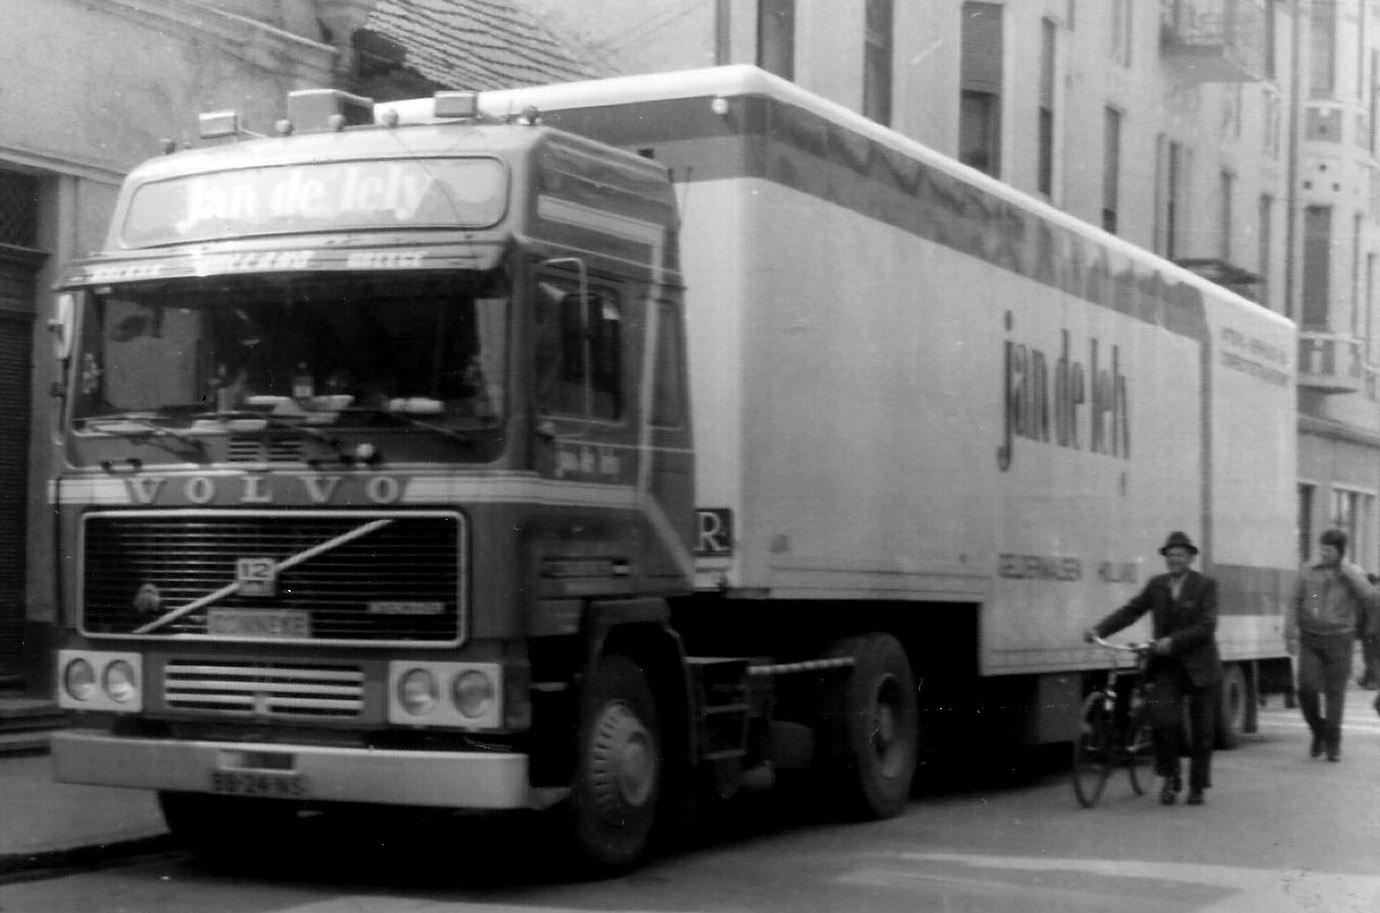 Gyorgy-Gyori-Oradea-back-in-the-80-s.--5